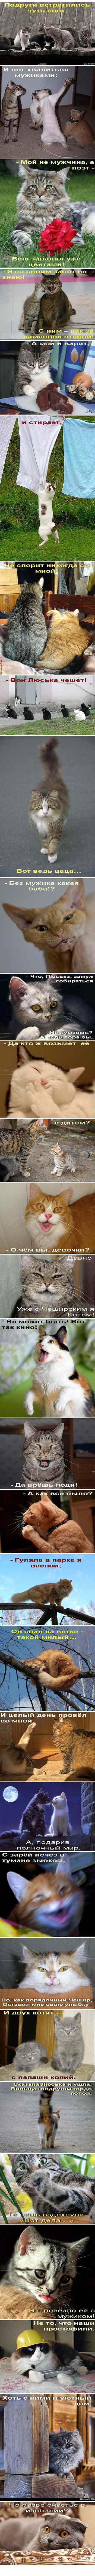 Кошкомикс-36 Подружки